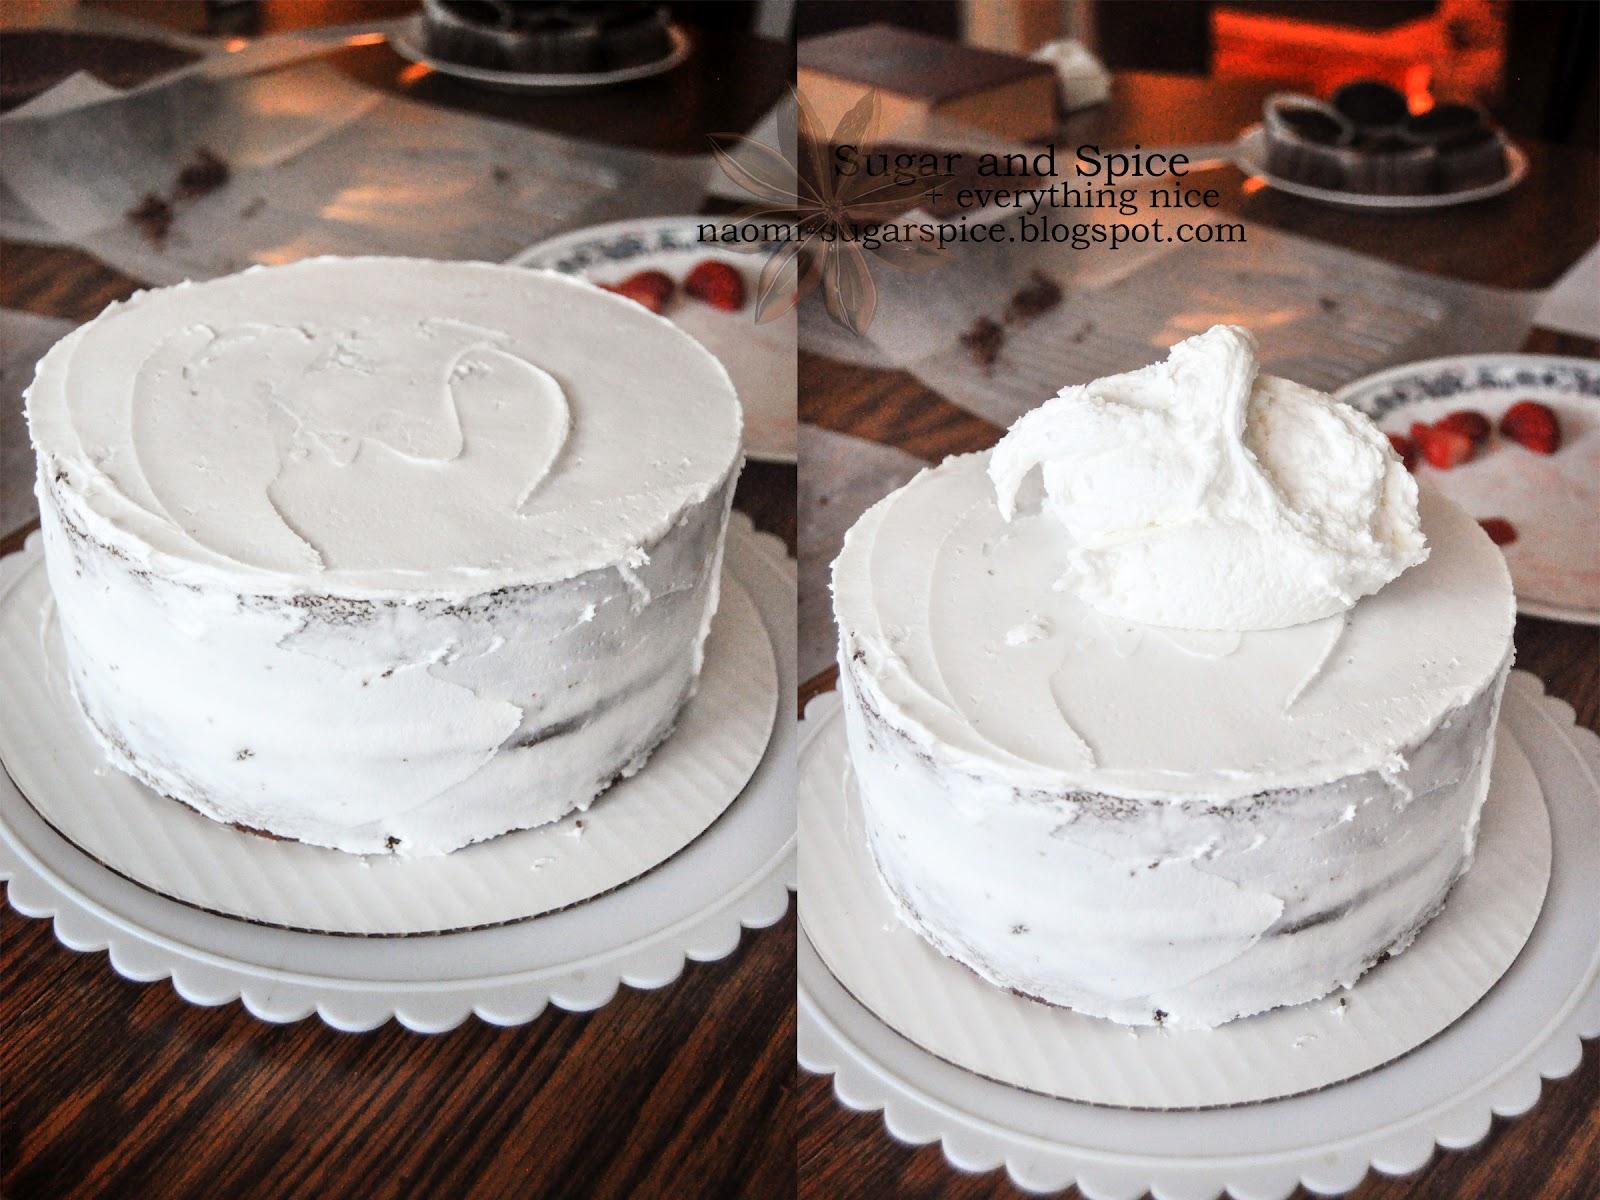 Cake Icing Recipe For Decorating: Cake Decorating Icing Without Shortening